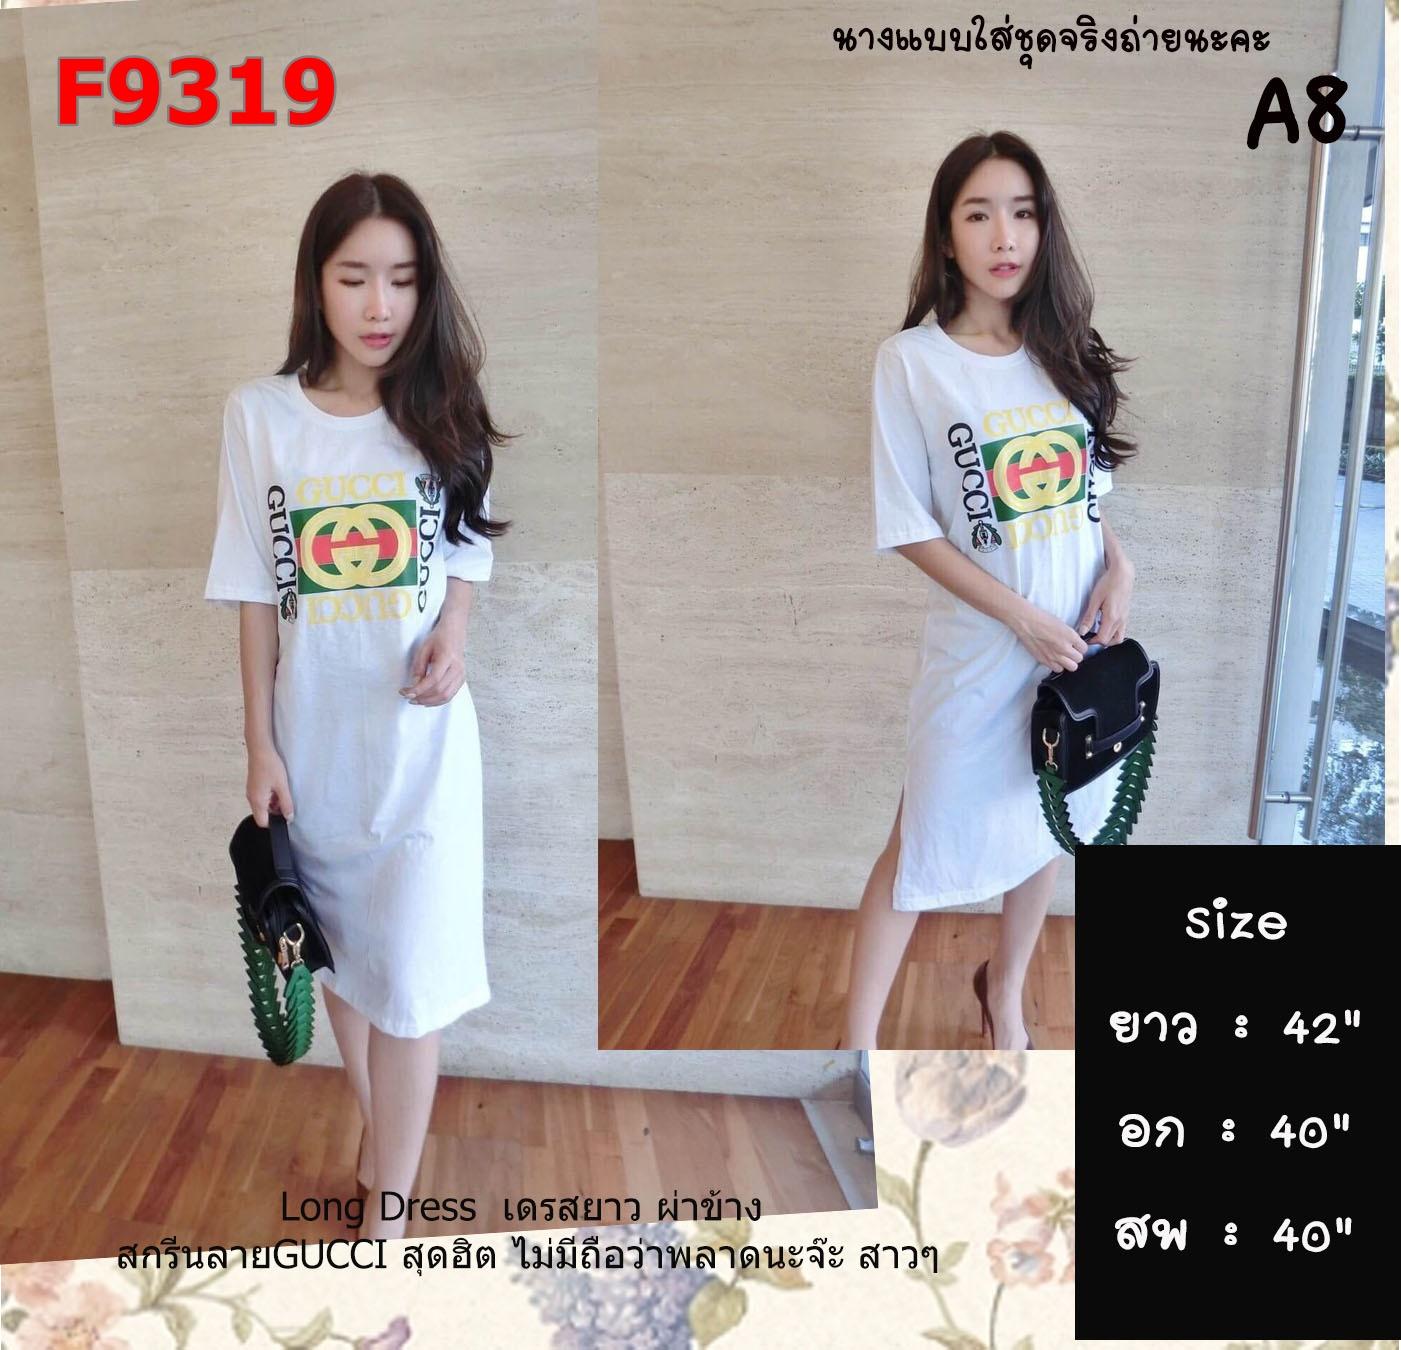 F9319 Long dress เดรสยาว ผ่าข้าง สกรีน GUCCI สุดฮิต สีขาว